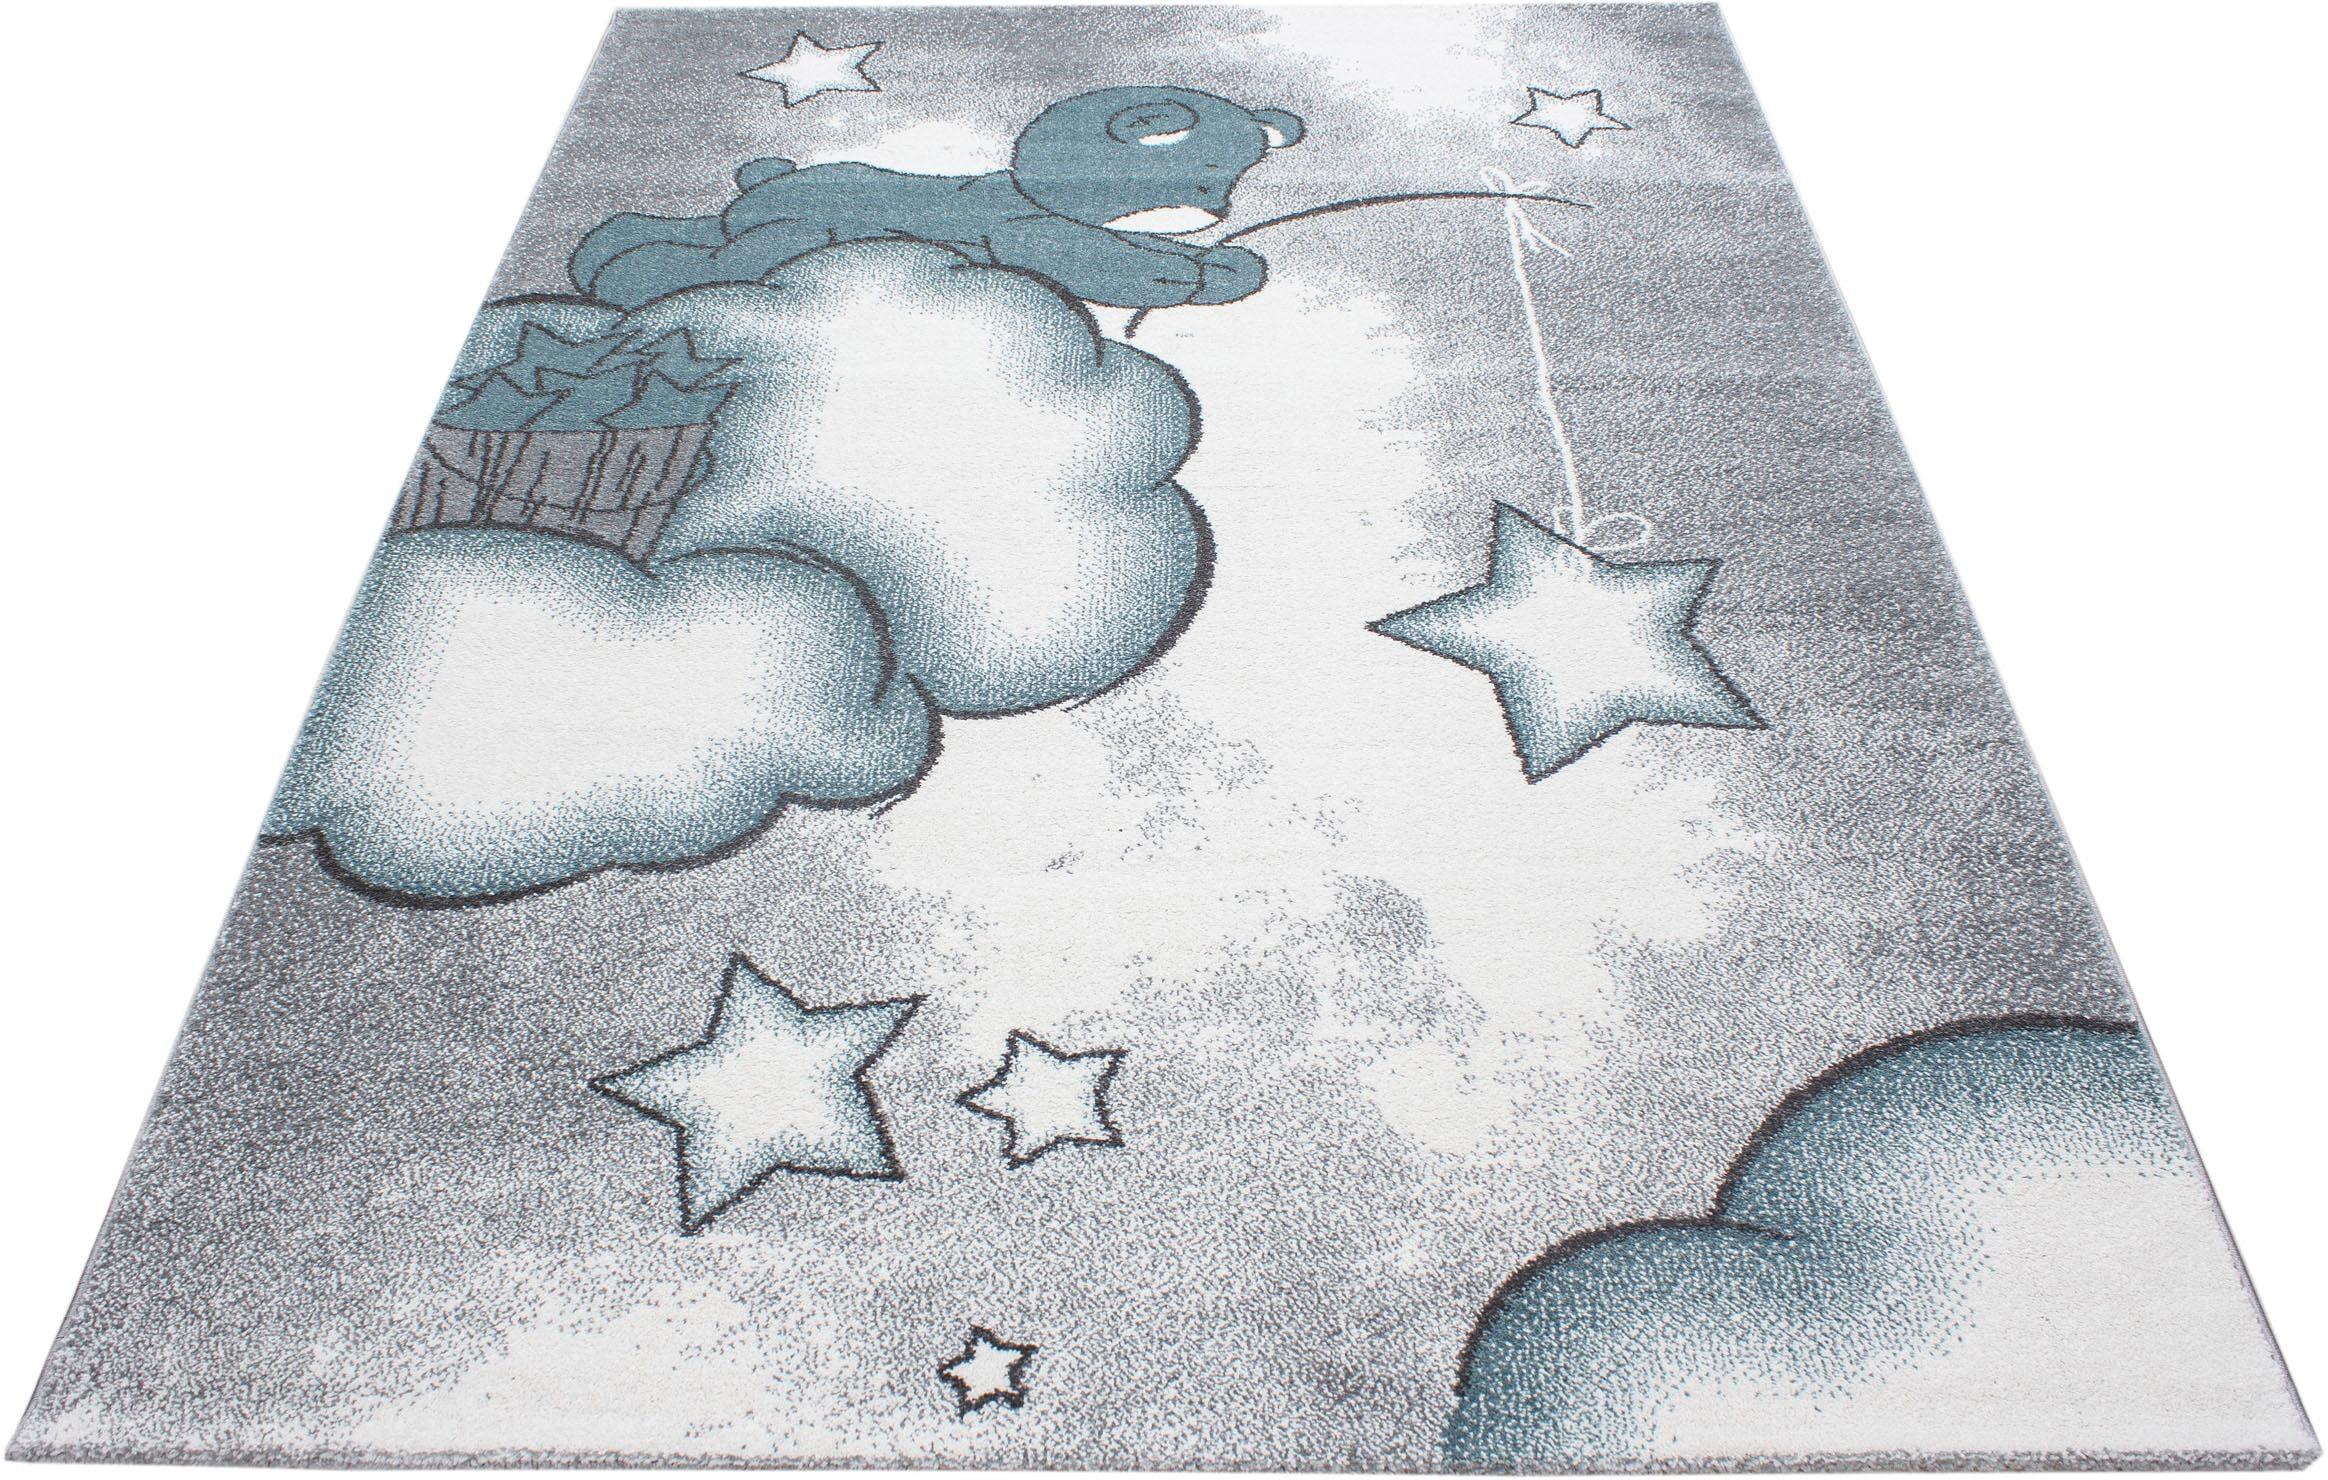 Kinderteppich Kids 580 Ayyildiz rechteckig Höhe 12 mm maschinell gewebt